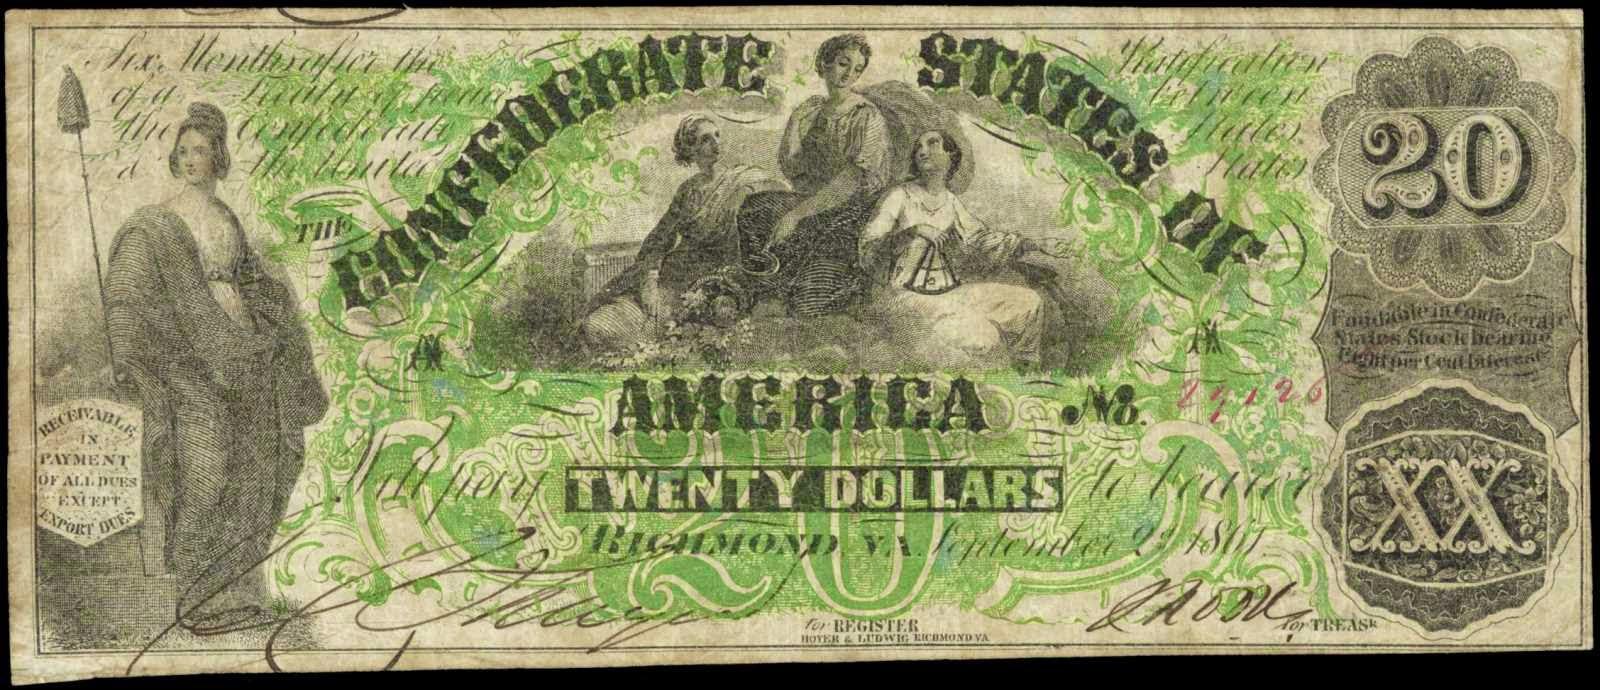 Confederate Currency 1861 20 Dollar Bill